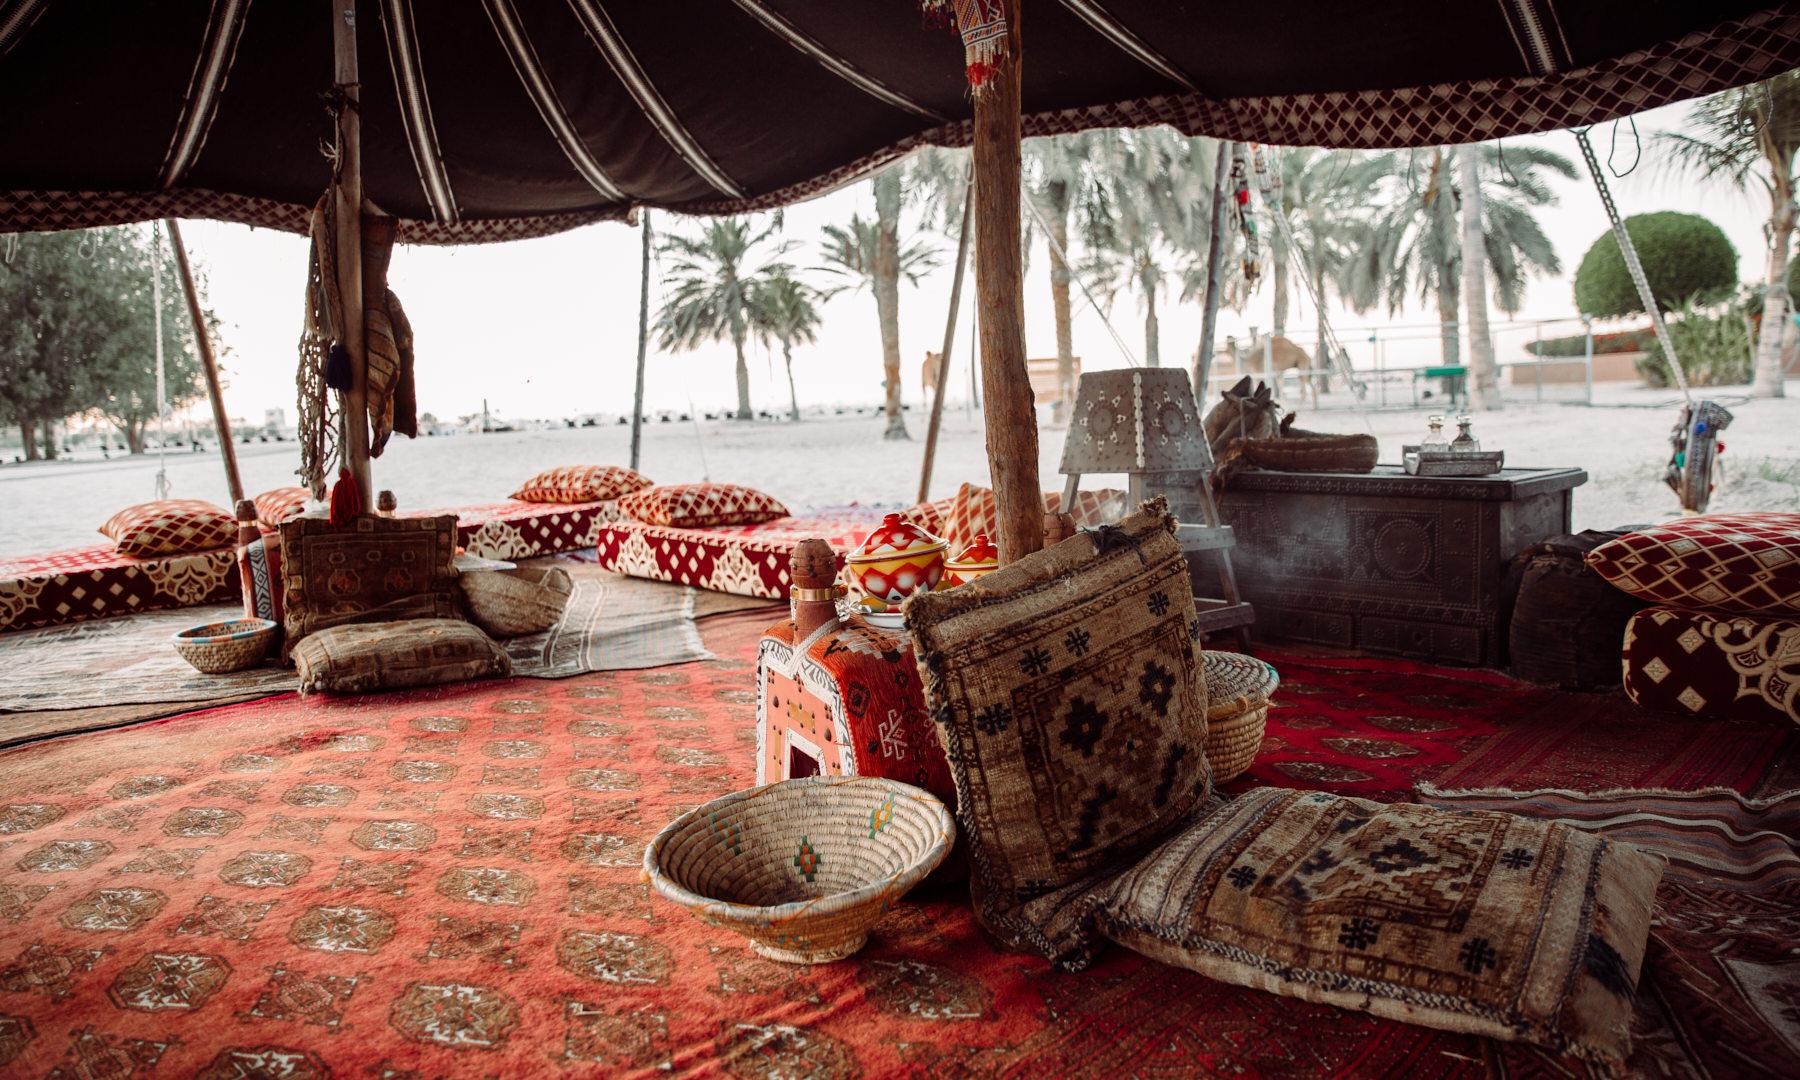 Ursula Musch Dubai by Mike Meyer Collect